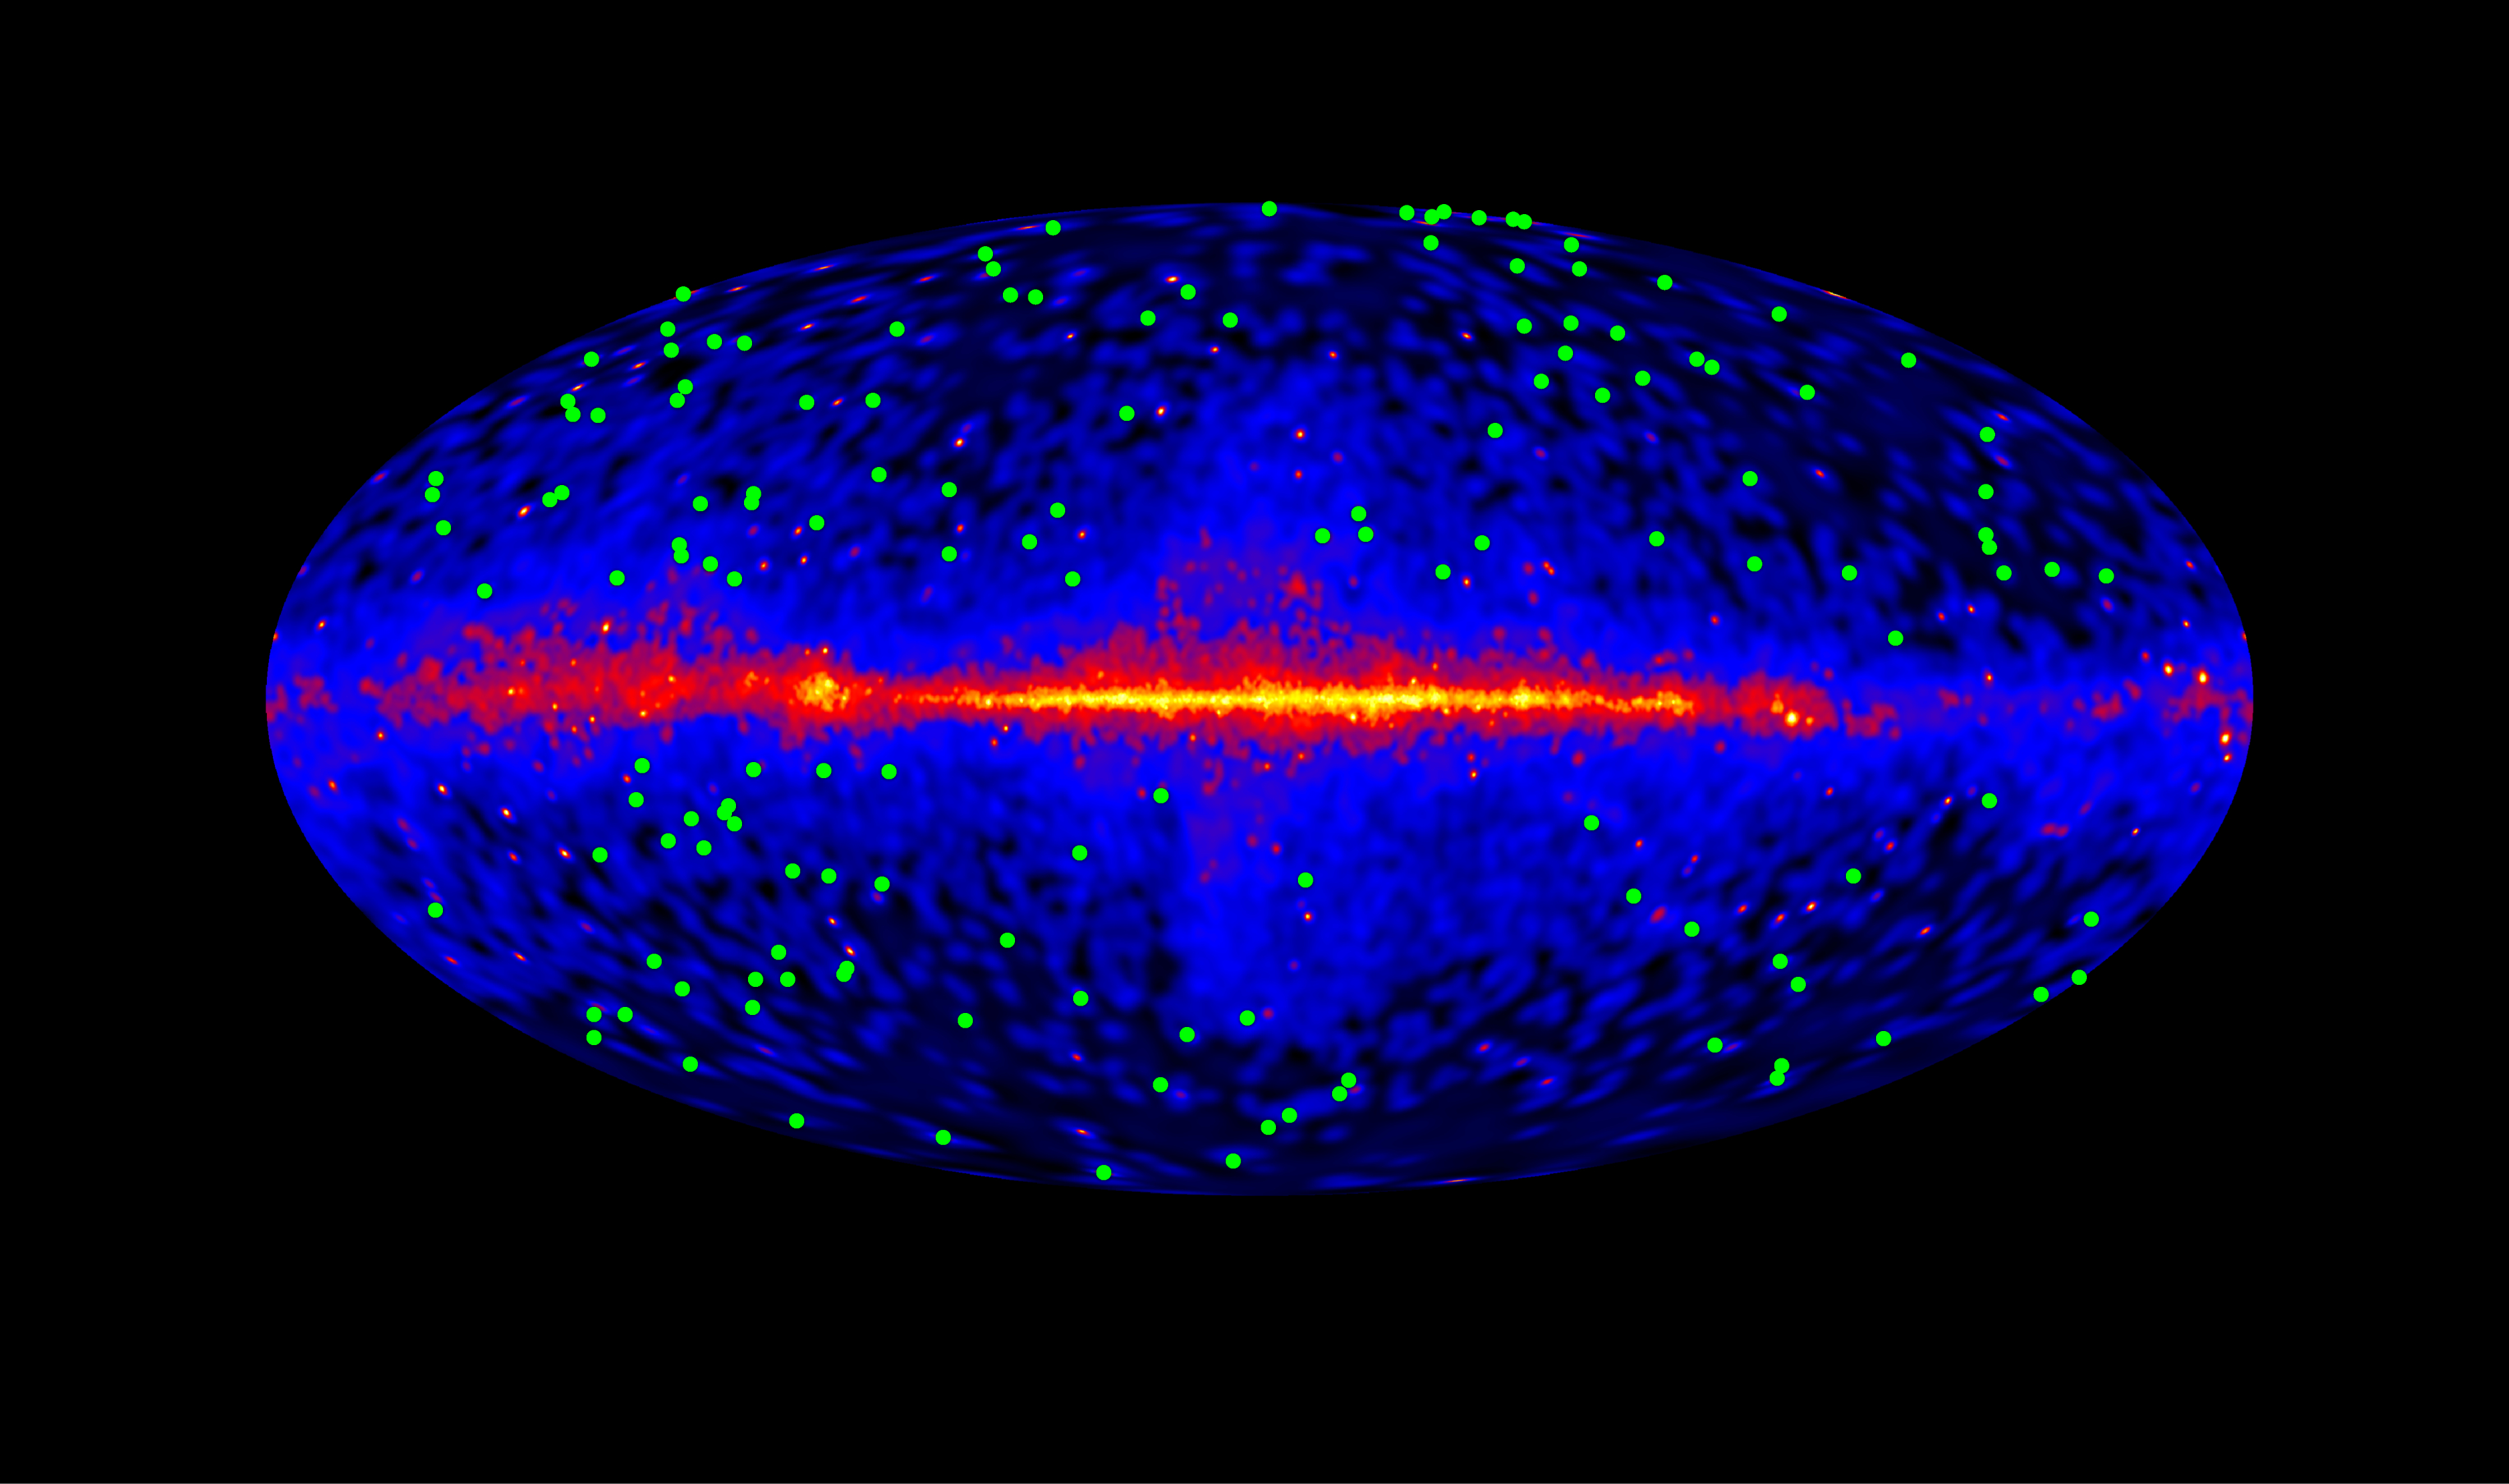 NASA - NASA'S Fermi Measures Cosmic 'Fog' Produced by ...